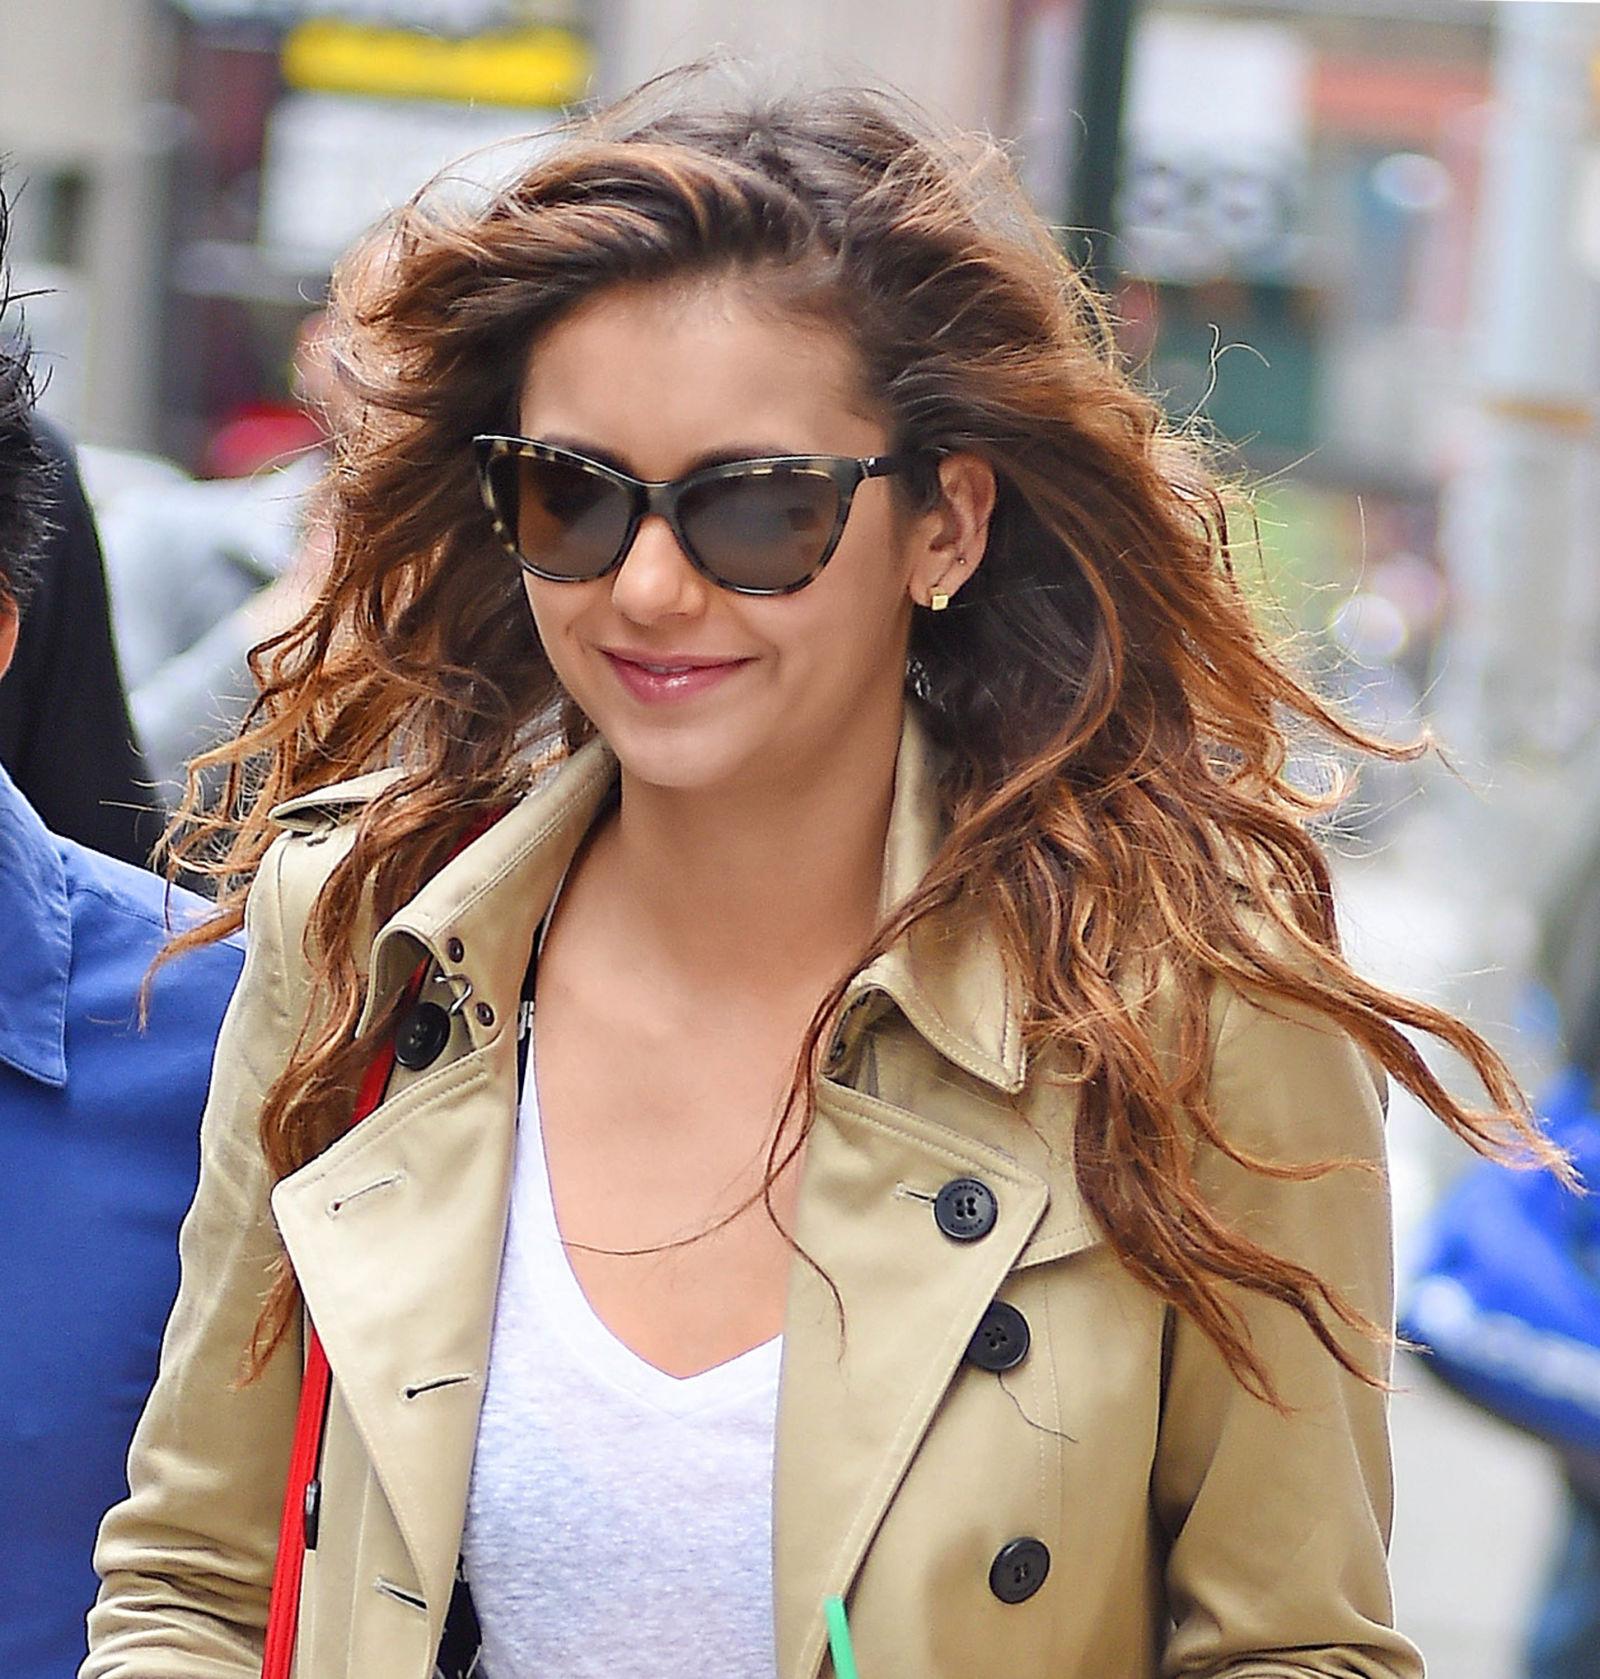 New York Style Sunglasses  sunglasses street style